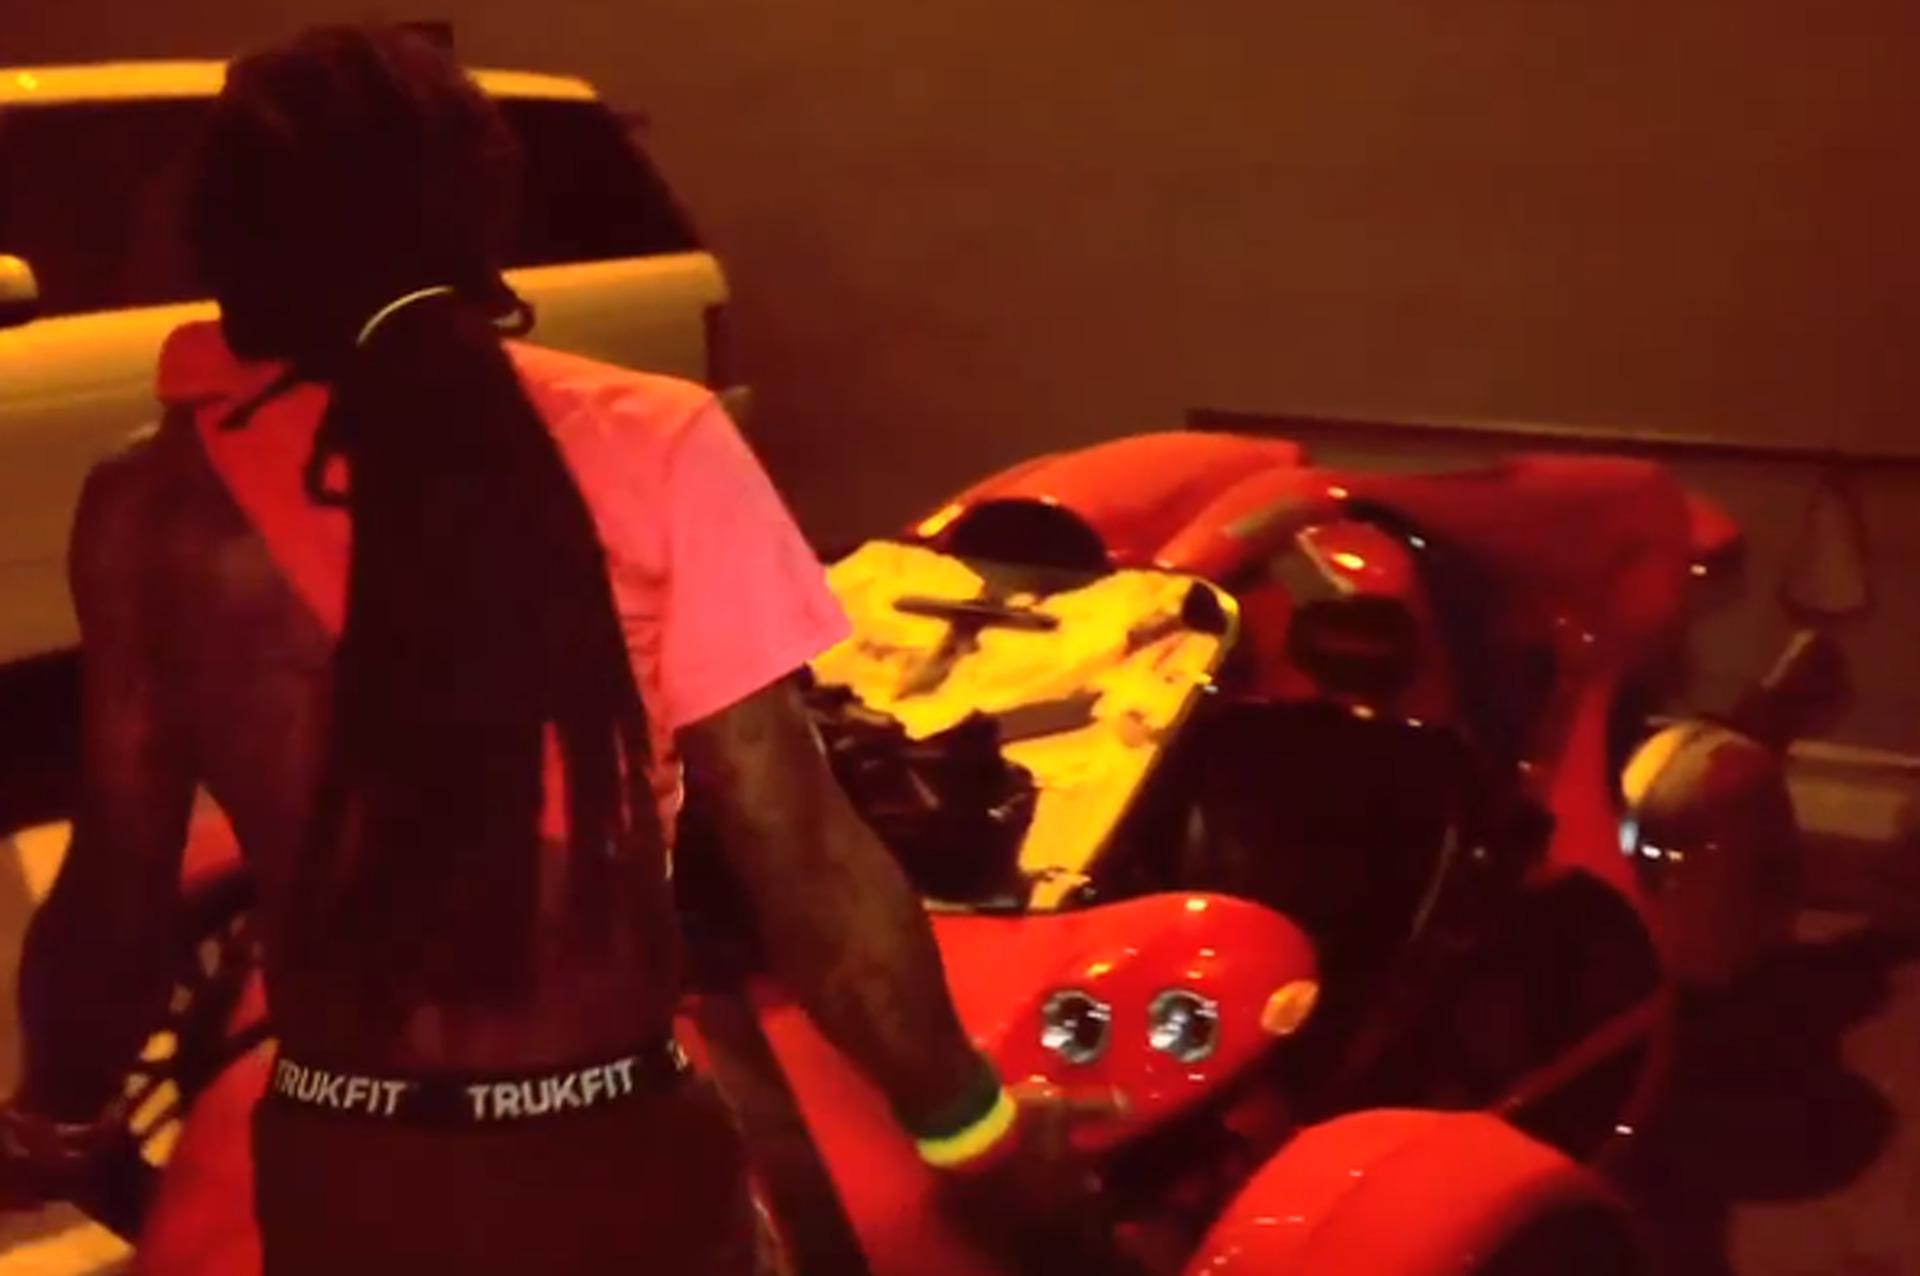 Nicki Minaj Buys Lil Wayne T-Rex, Proves She Has No Taste in Vehicles